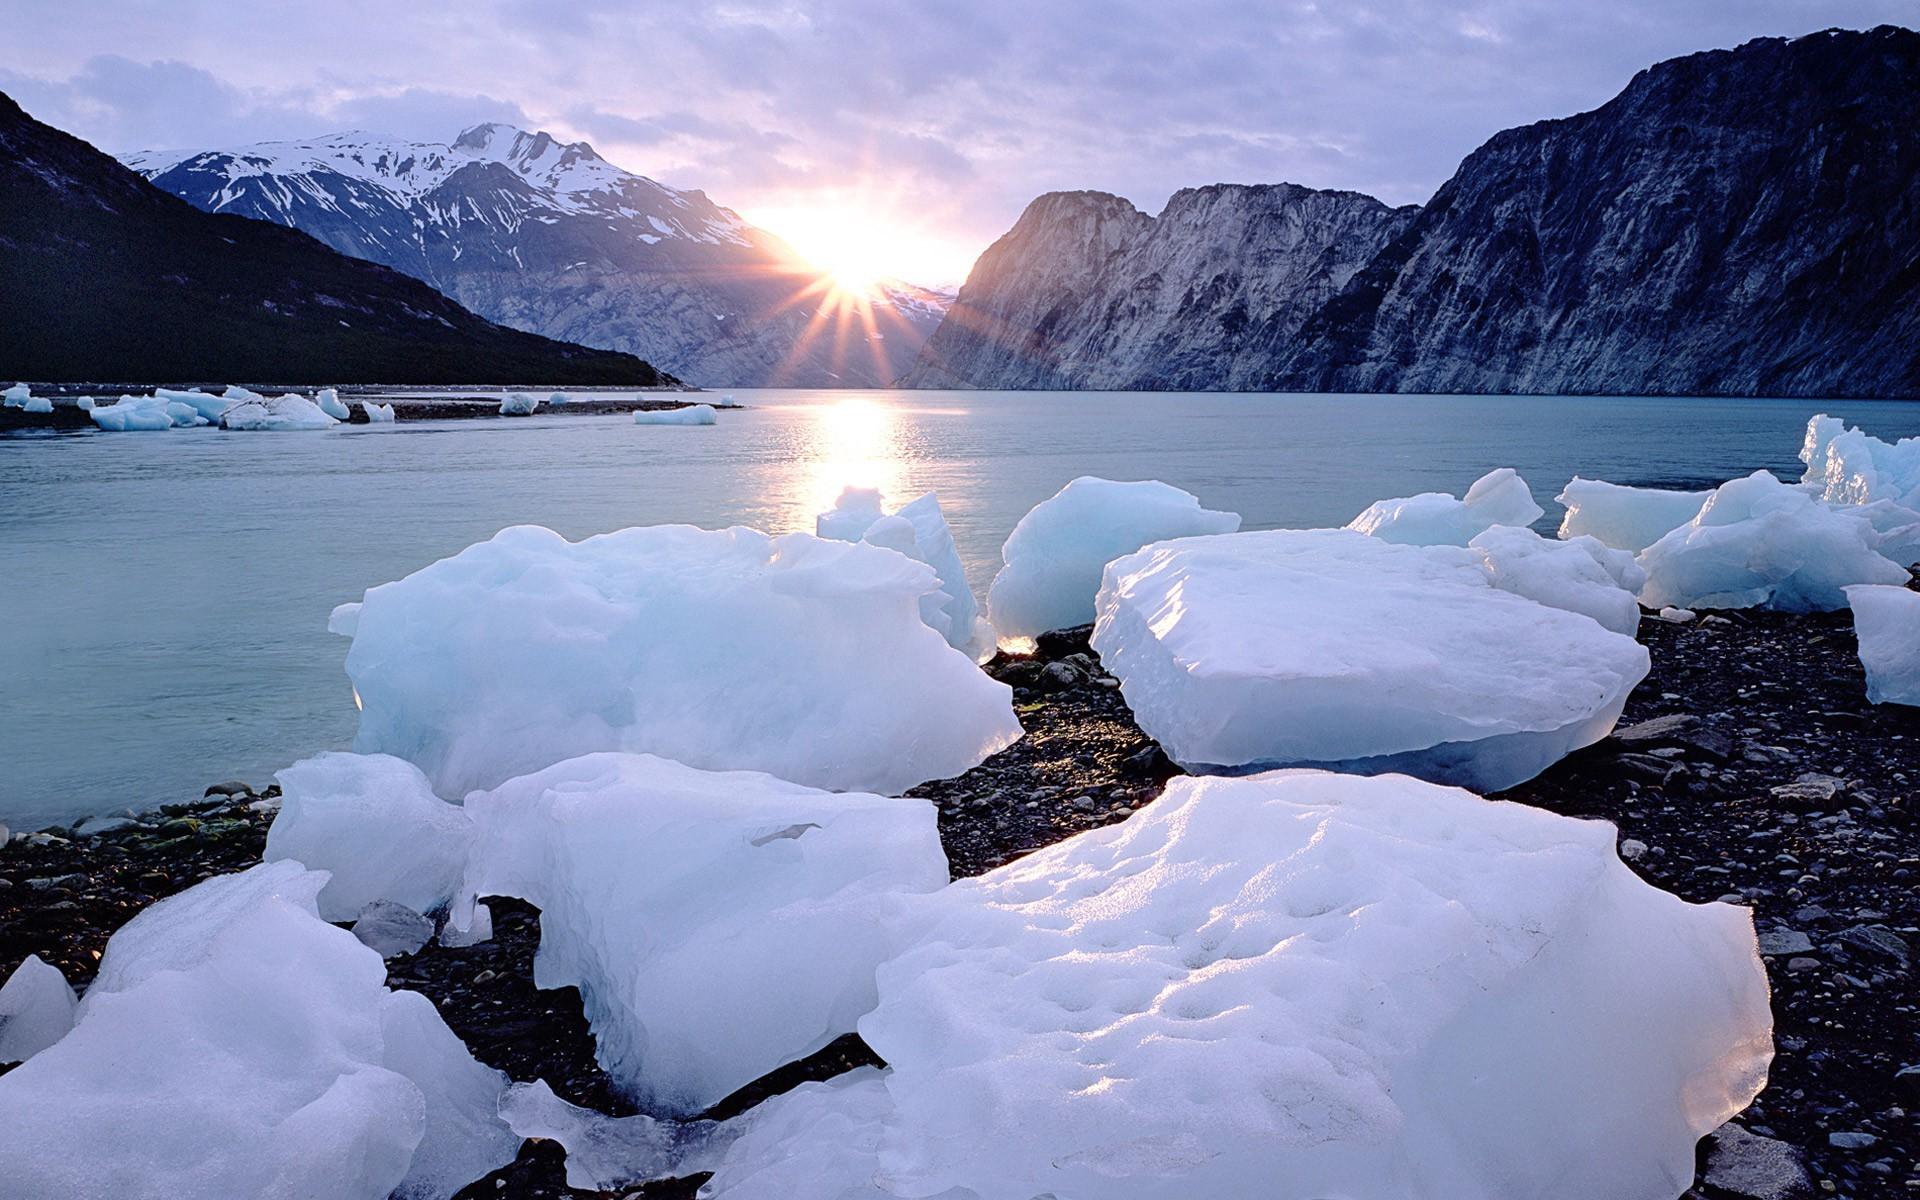 Wonderful Wallpaper Mountain Windows 7 - sunlight-lake-water-nature-reflection-snow-winter-photography-iceberg-ice-Arctic-Windows-7-Freezing-melting-mountain-weather-season-1920x1200-px-geological-phenomenon-mountain-range-sea-ice-arctic-ocean-glacial-landform-613721  Gallery_169663.jpg